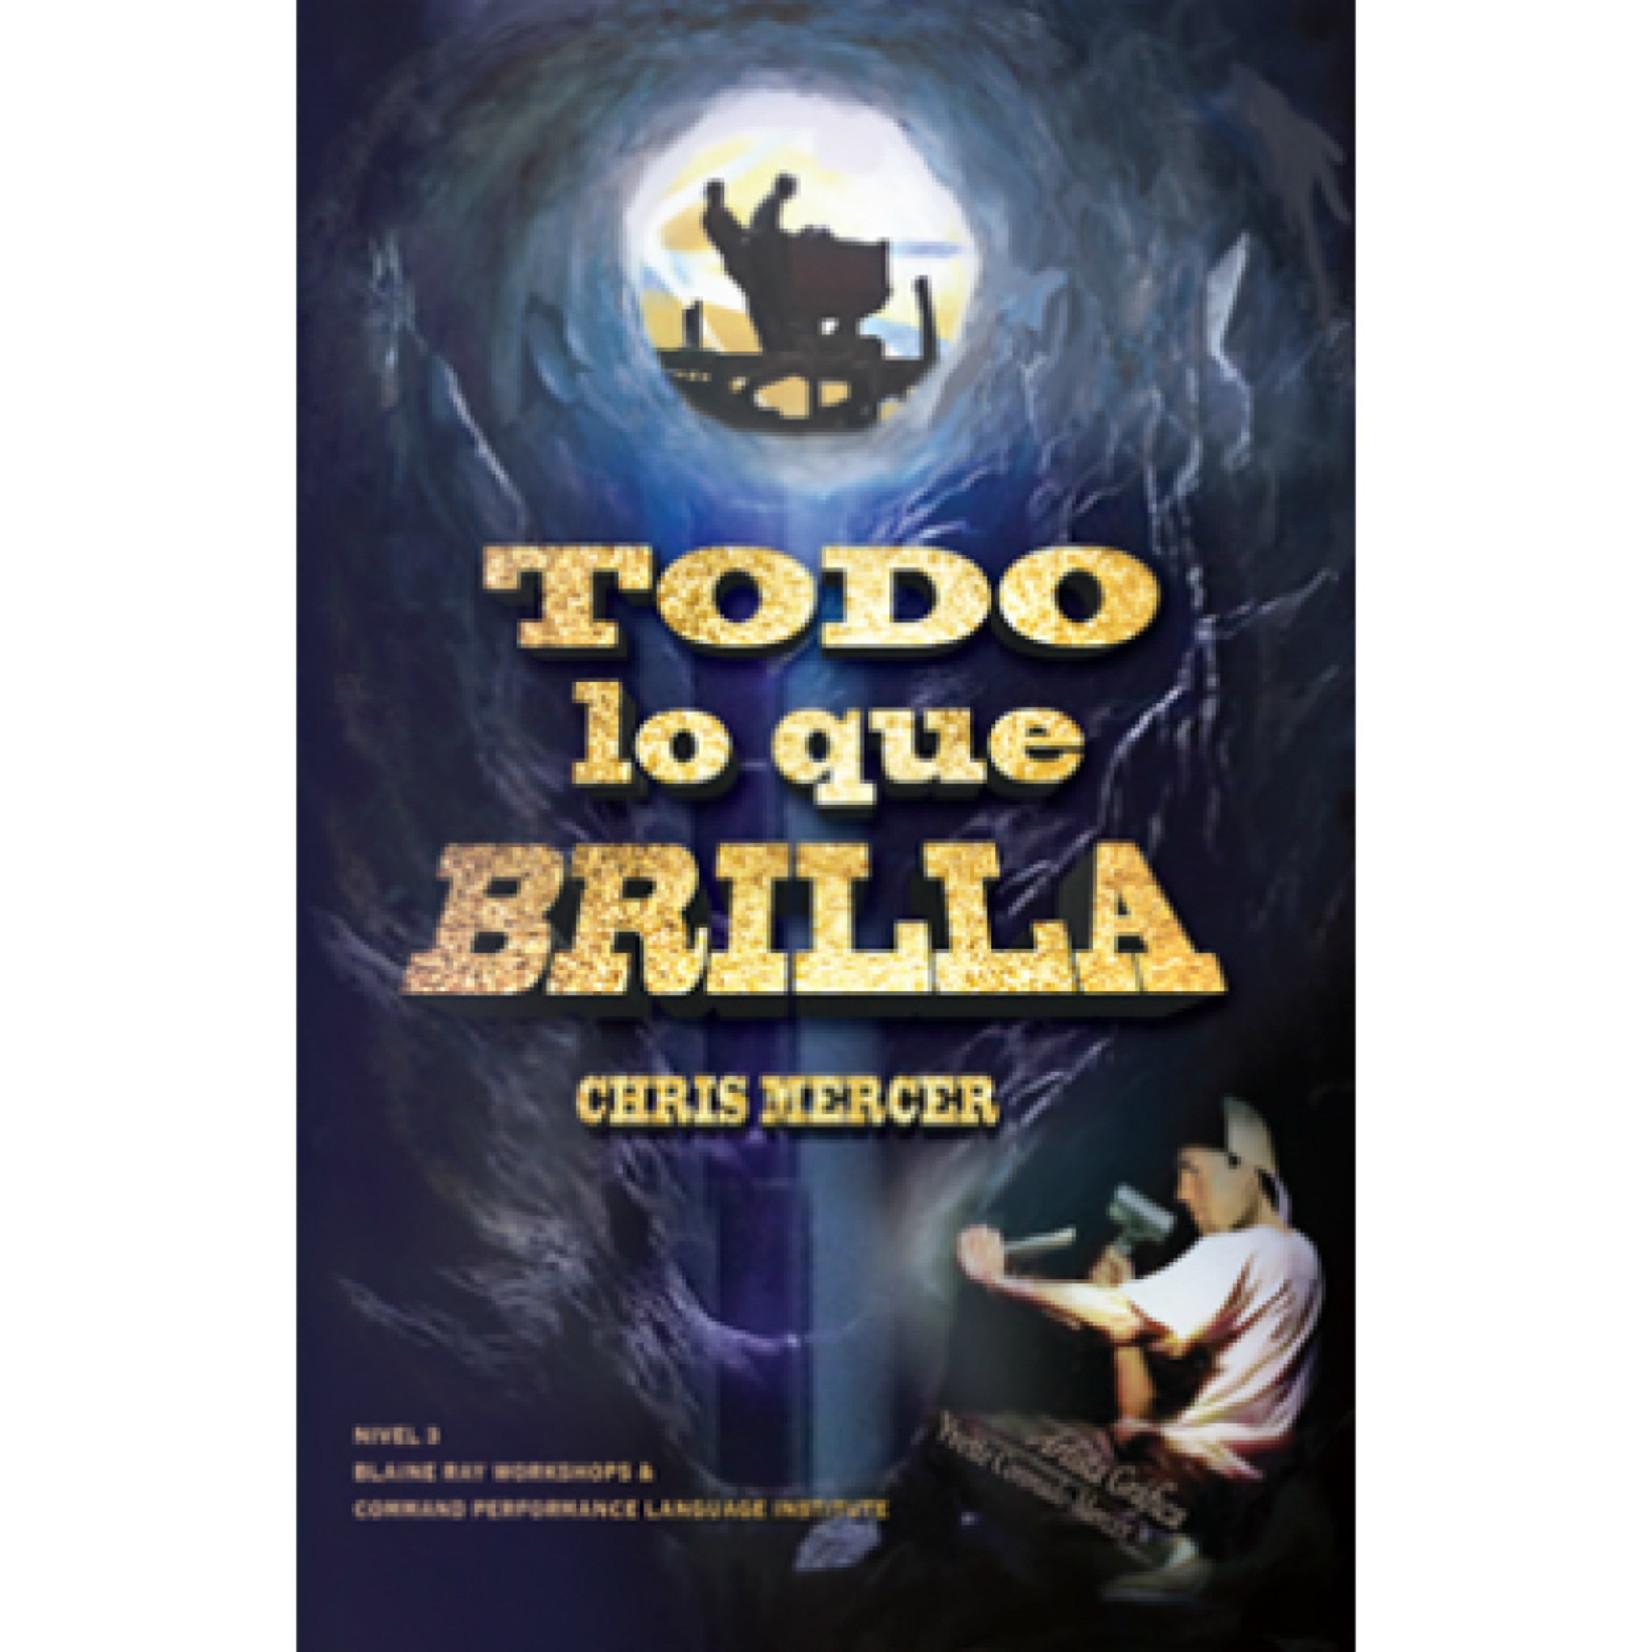 Chris Mercer Books Todo lo que brilla